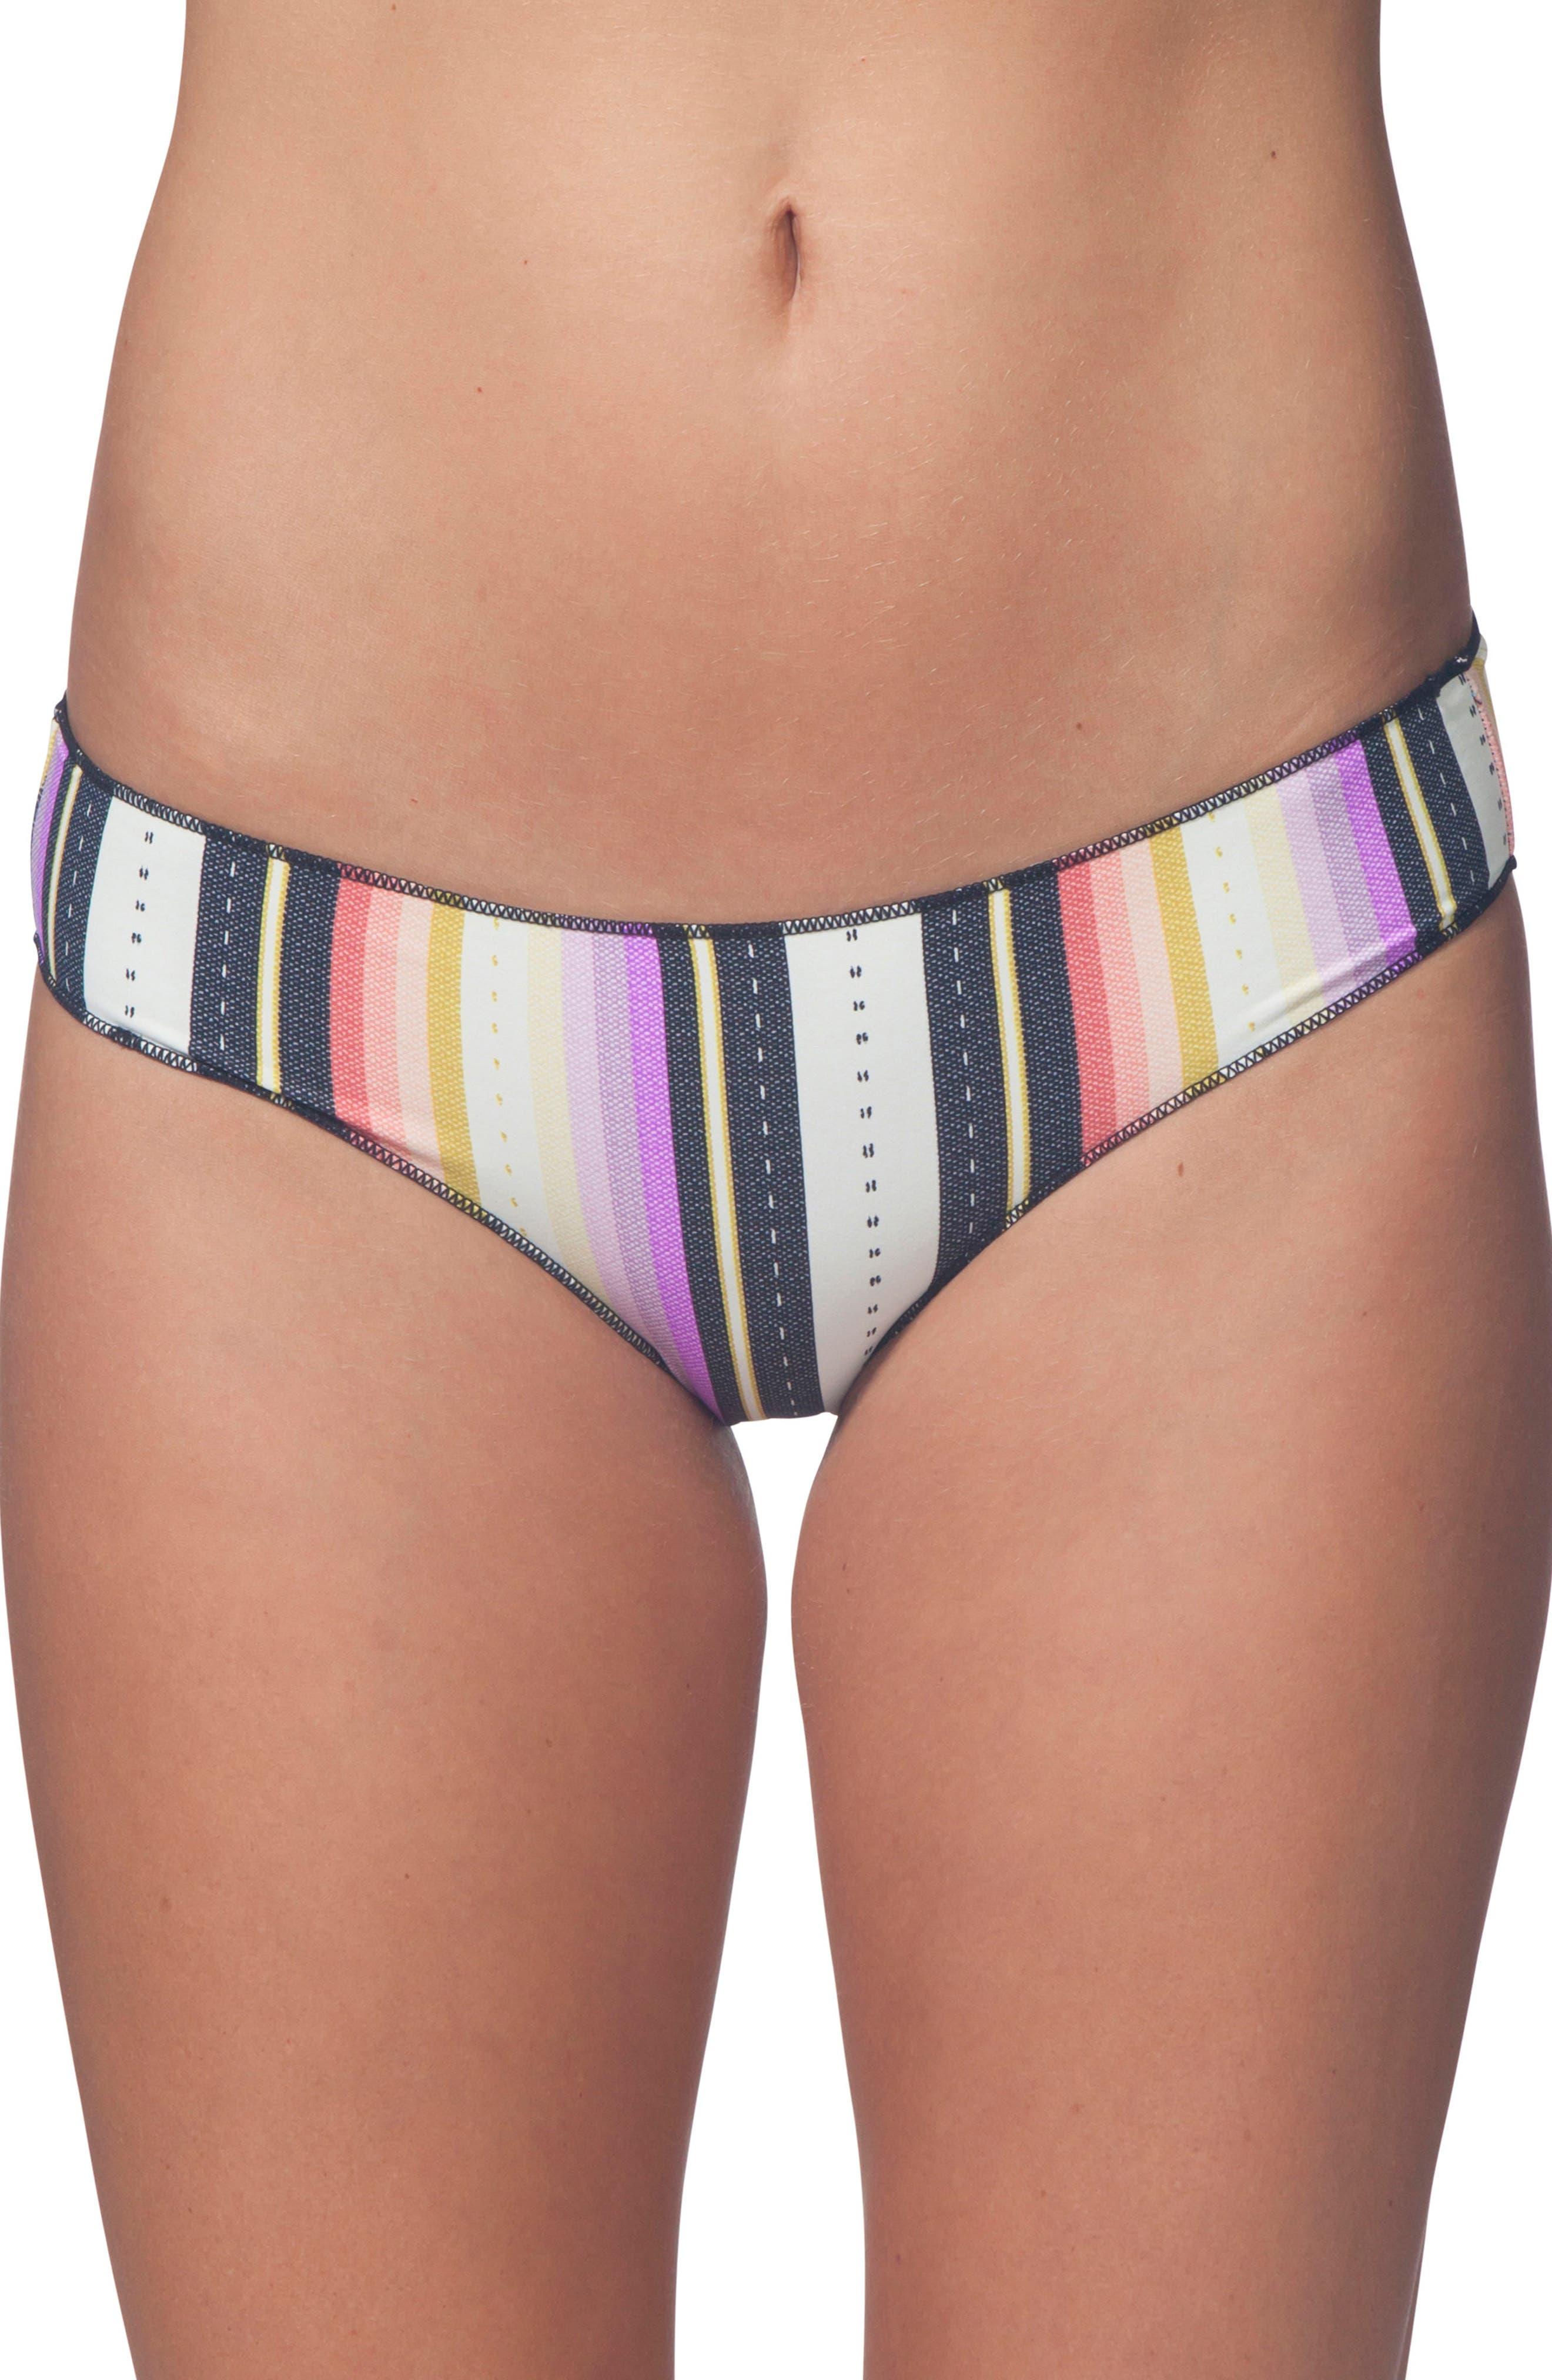 Sayulita Stripe Hipster Bikini Bottoms,                             Main thumbnail 1, color,                             White Multi